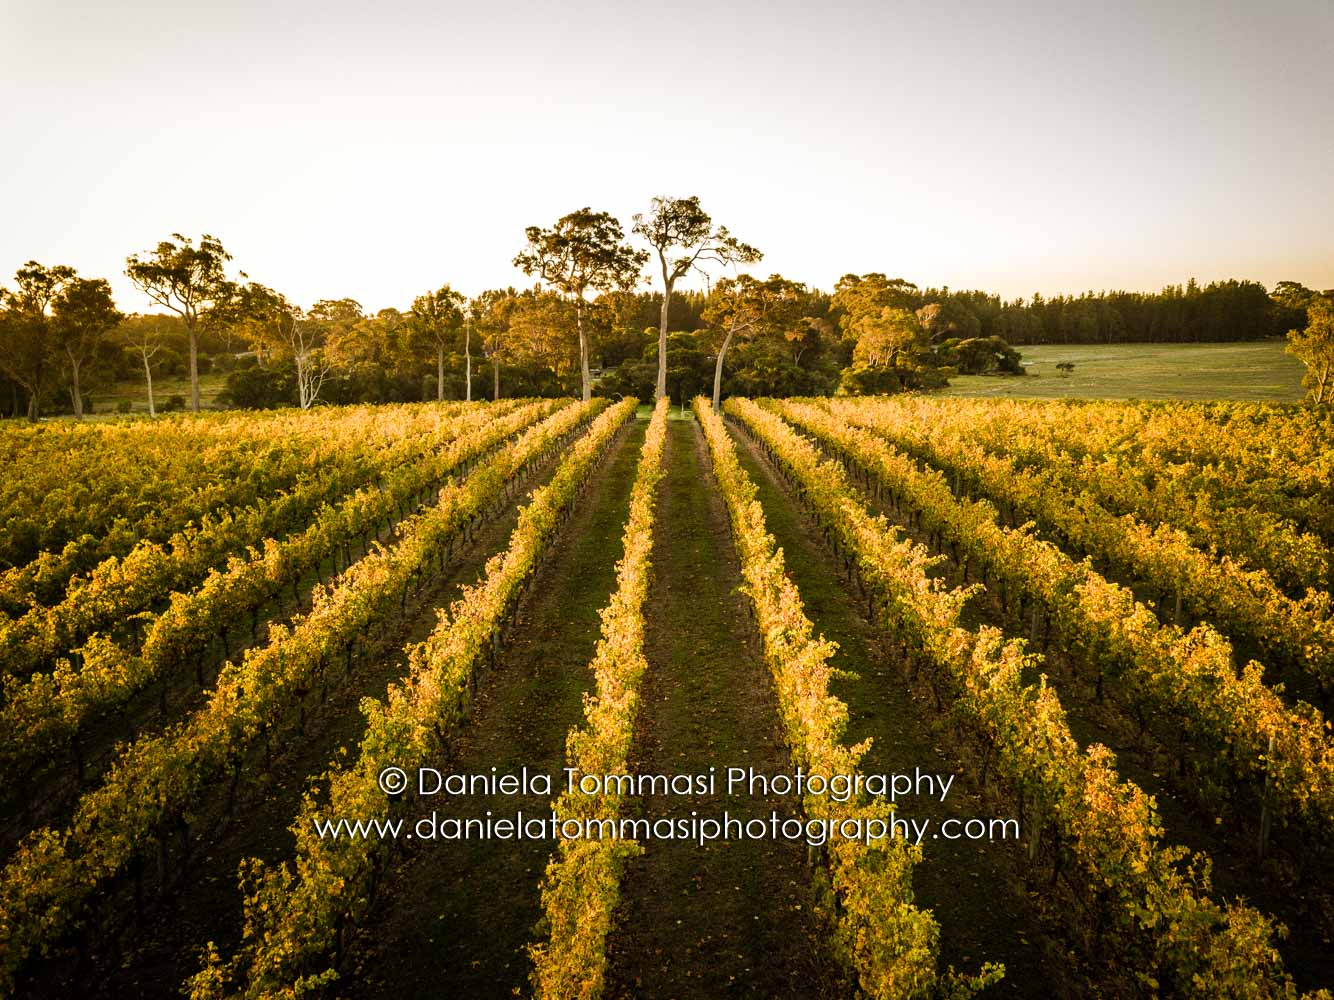 Winery-Daniela Tommasi Photography-15